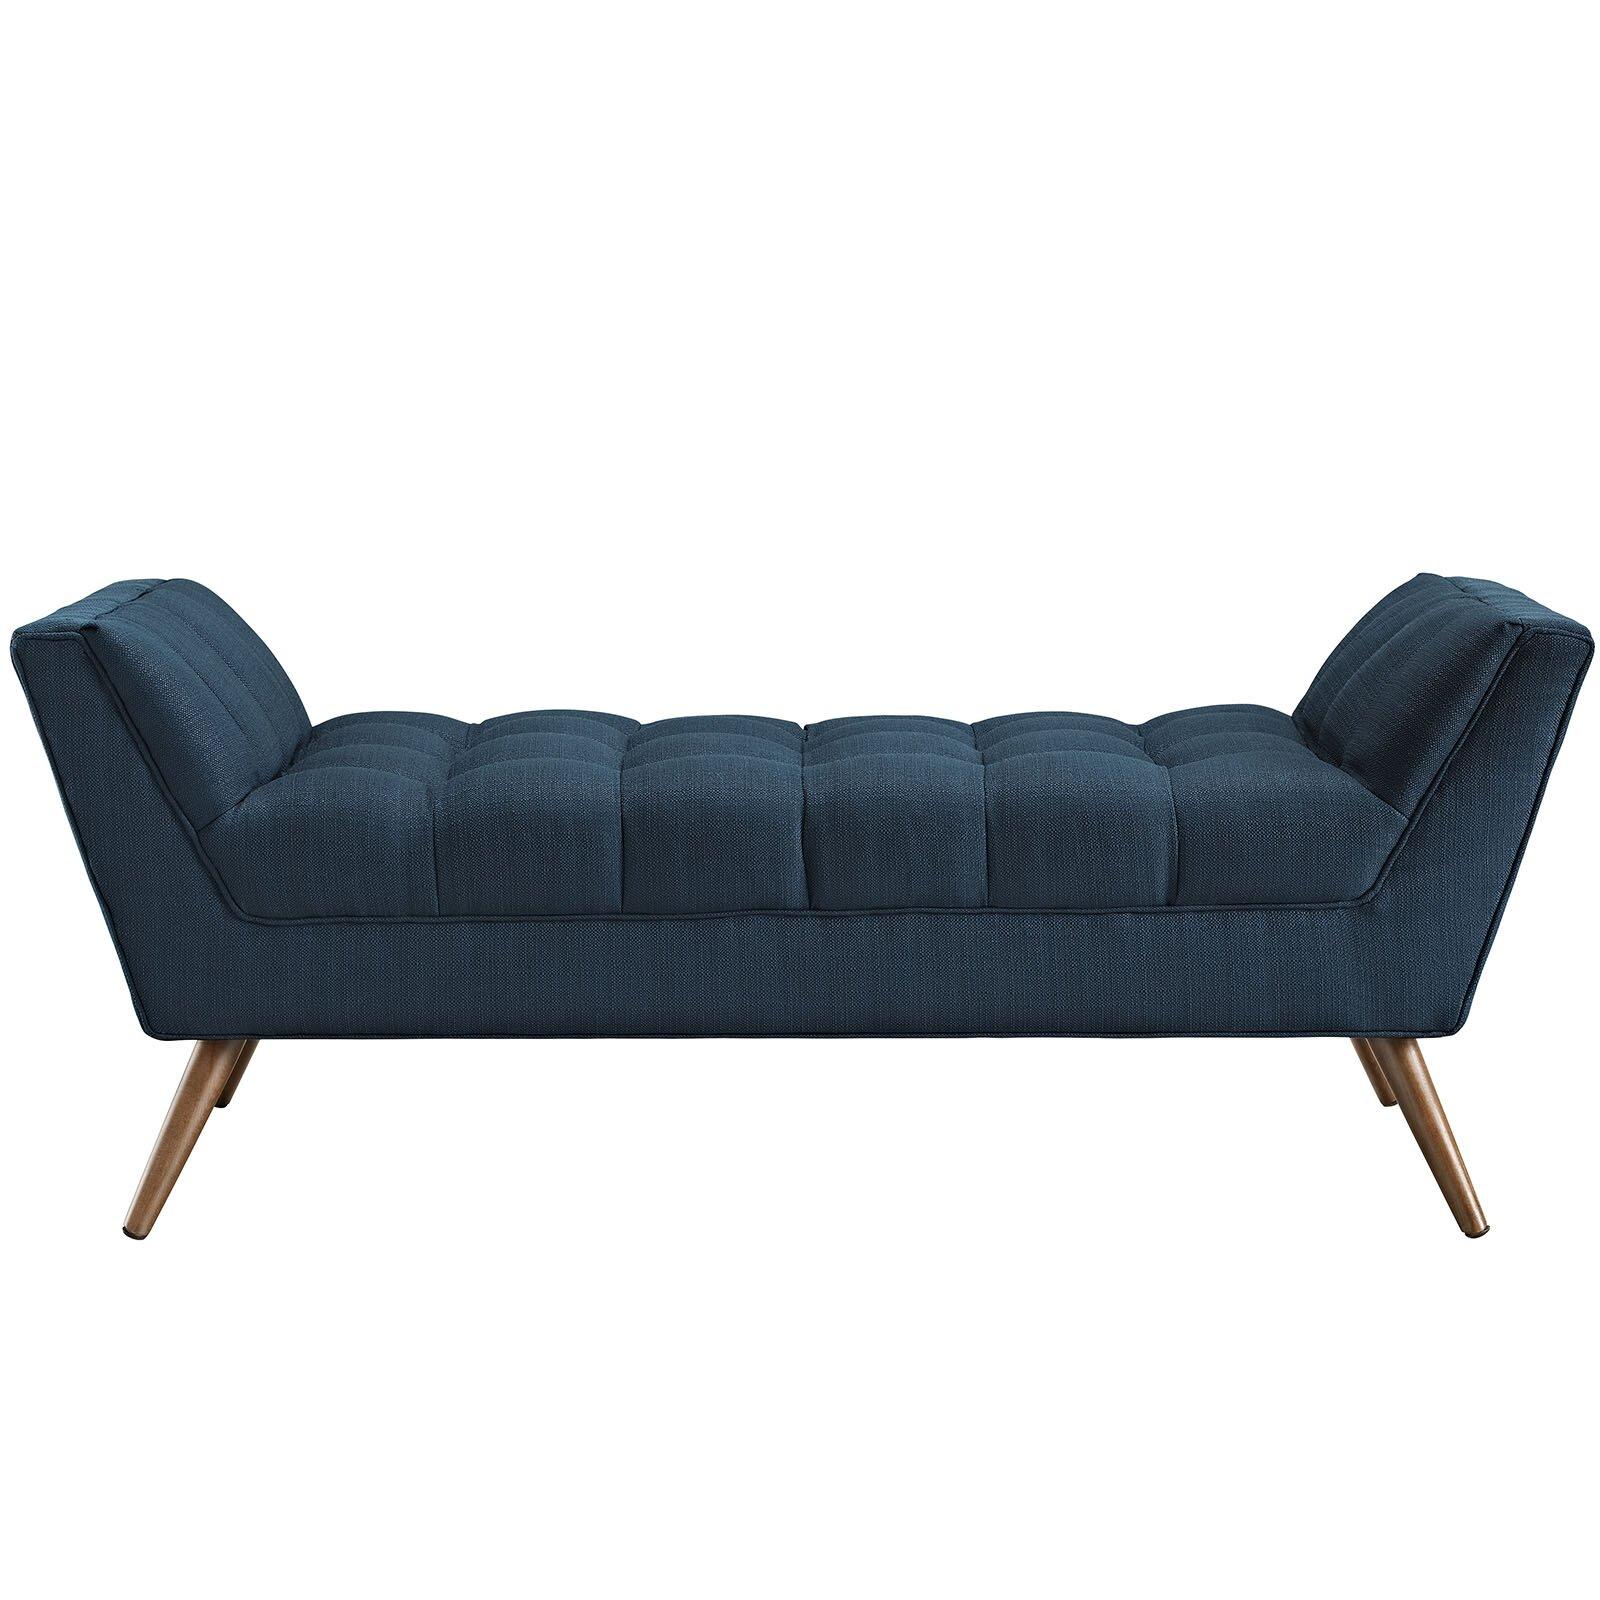 Response Upholstered Bedroom Bench